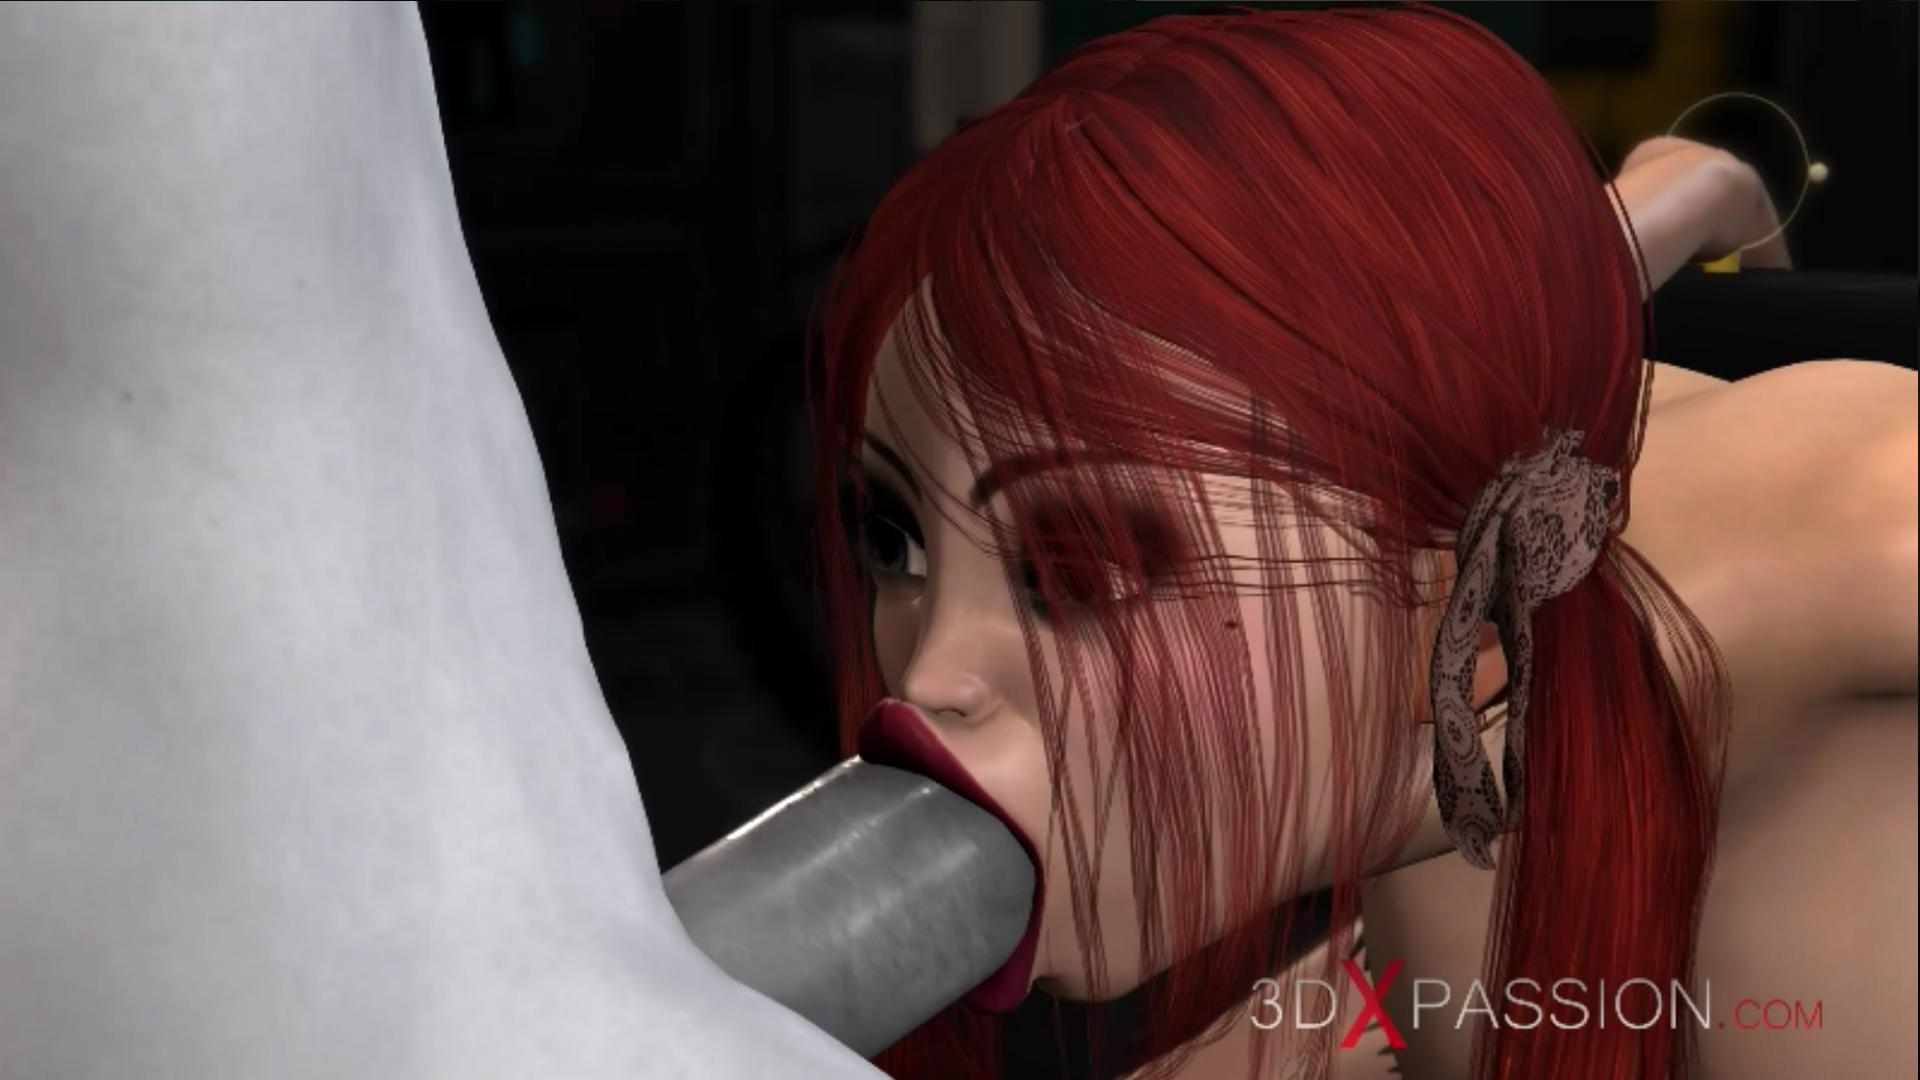 Sexy schoolgirl slave extreme deepthroat sci-fi dickgirl lab